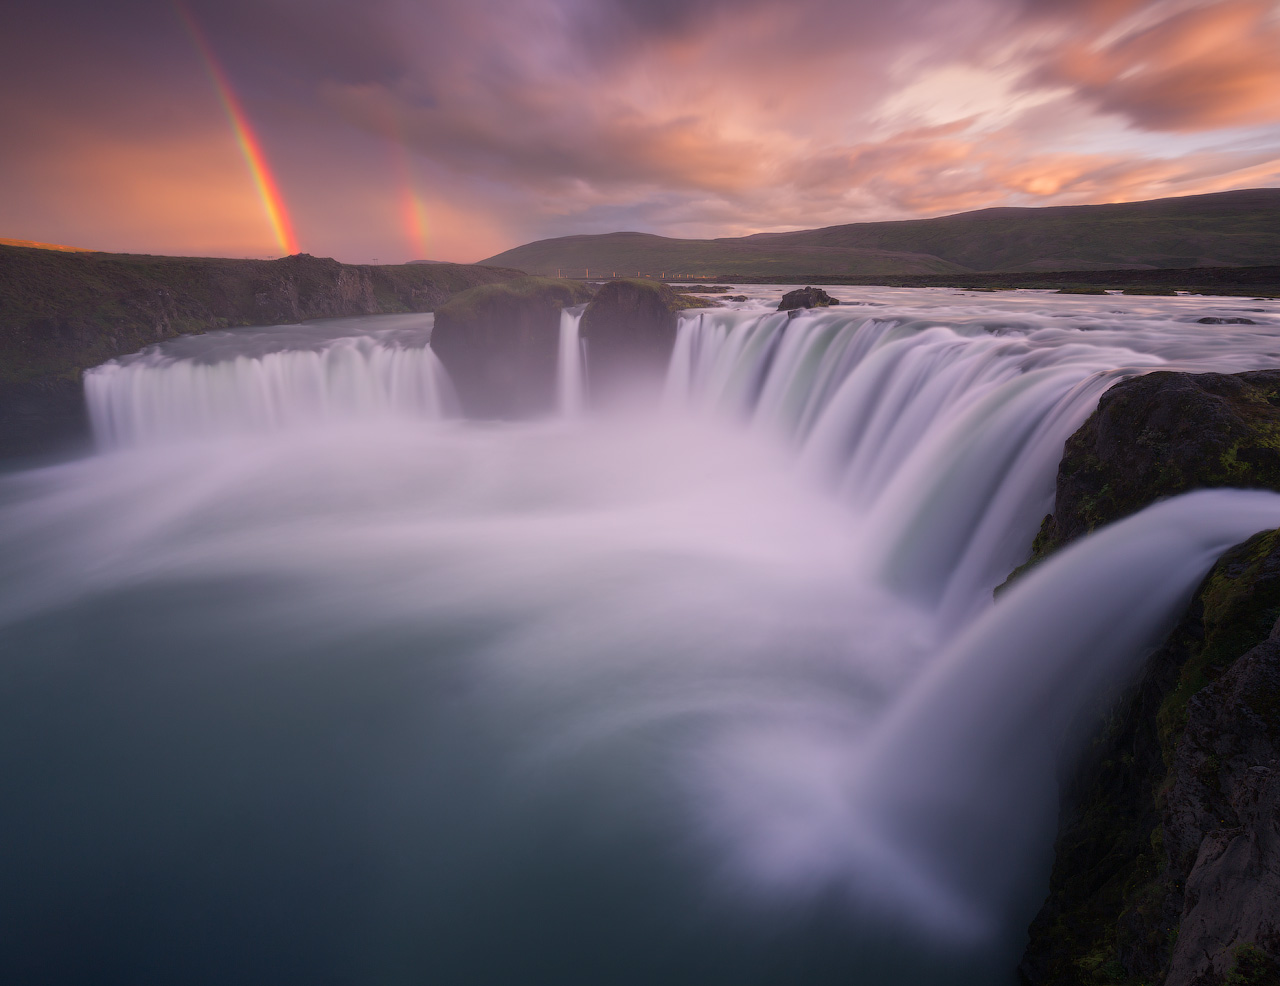 Geschmückt mit einem prachtvollen Regenbogen, donnert der mächtige und wunderschöne Wasserfall Godafoss in den Fluss Skjalfandafljot.